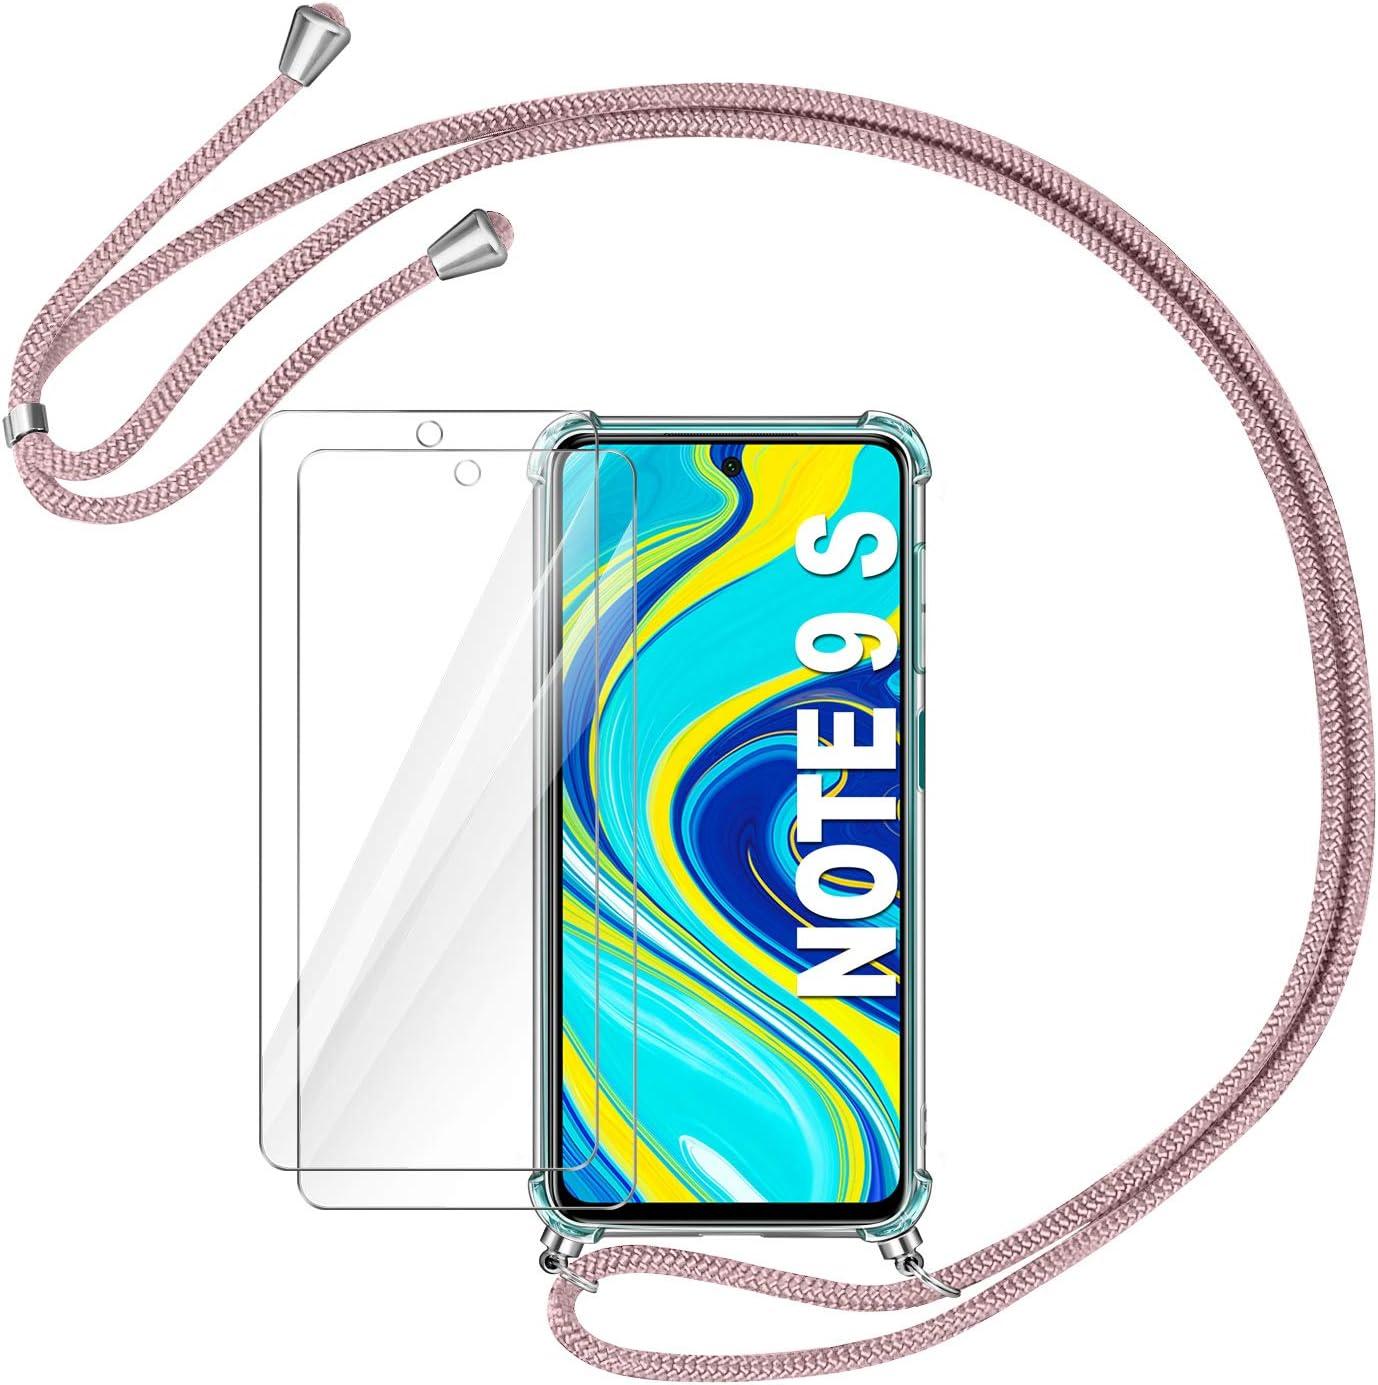 AROYI Funda con Cuerda para Xiaomi Redmi Note 9S / Note 9 Pro/Note 9 Pro MAX + 2 x Protector Pantalla, Carcasa Transparente TPU Silicona Case con Colgante Ajustable Collar Correa de Cordón, Oro Rosa